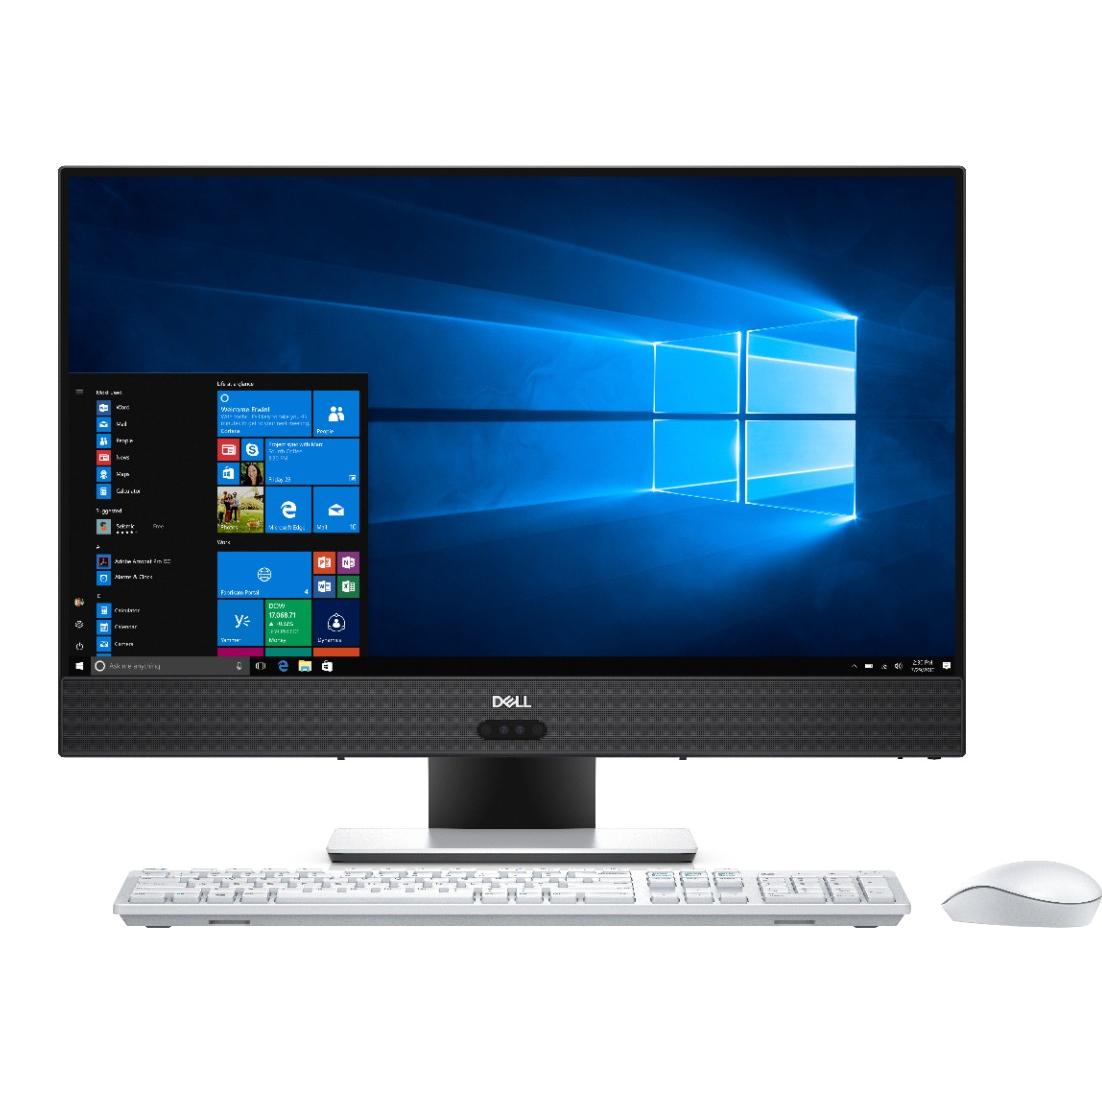 Sistem All-In-One Dell Inspiron 5475 23.8 Full HD Touch AMD A10-9700E RX 560-4GB RAM 8GB HDD 1TB + SSD 128GB Linux